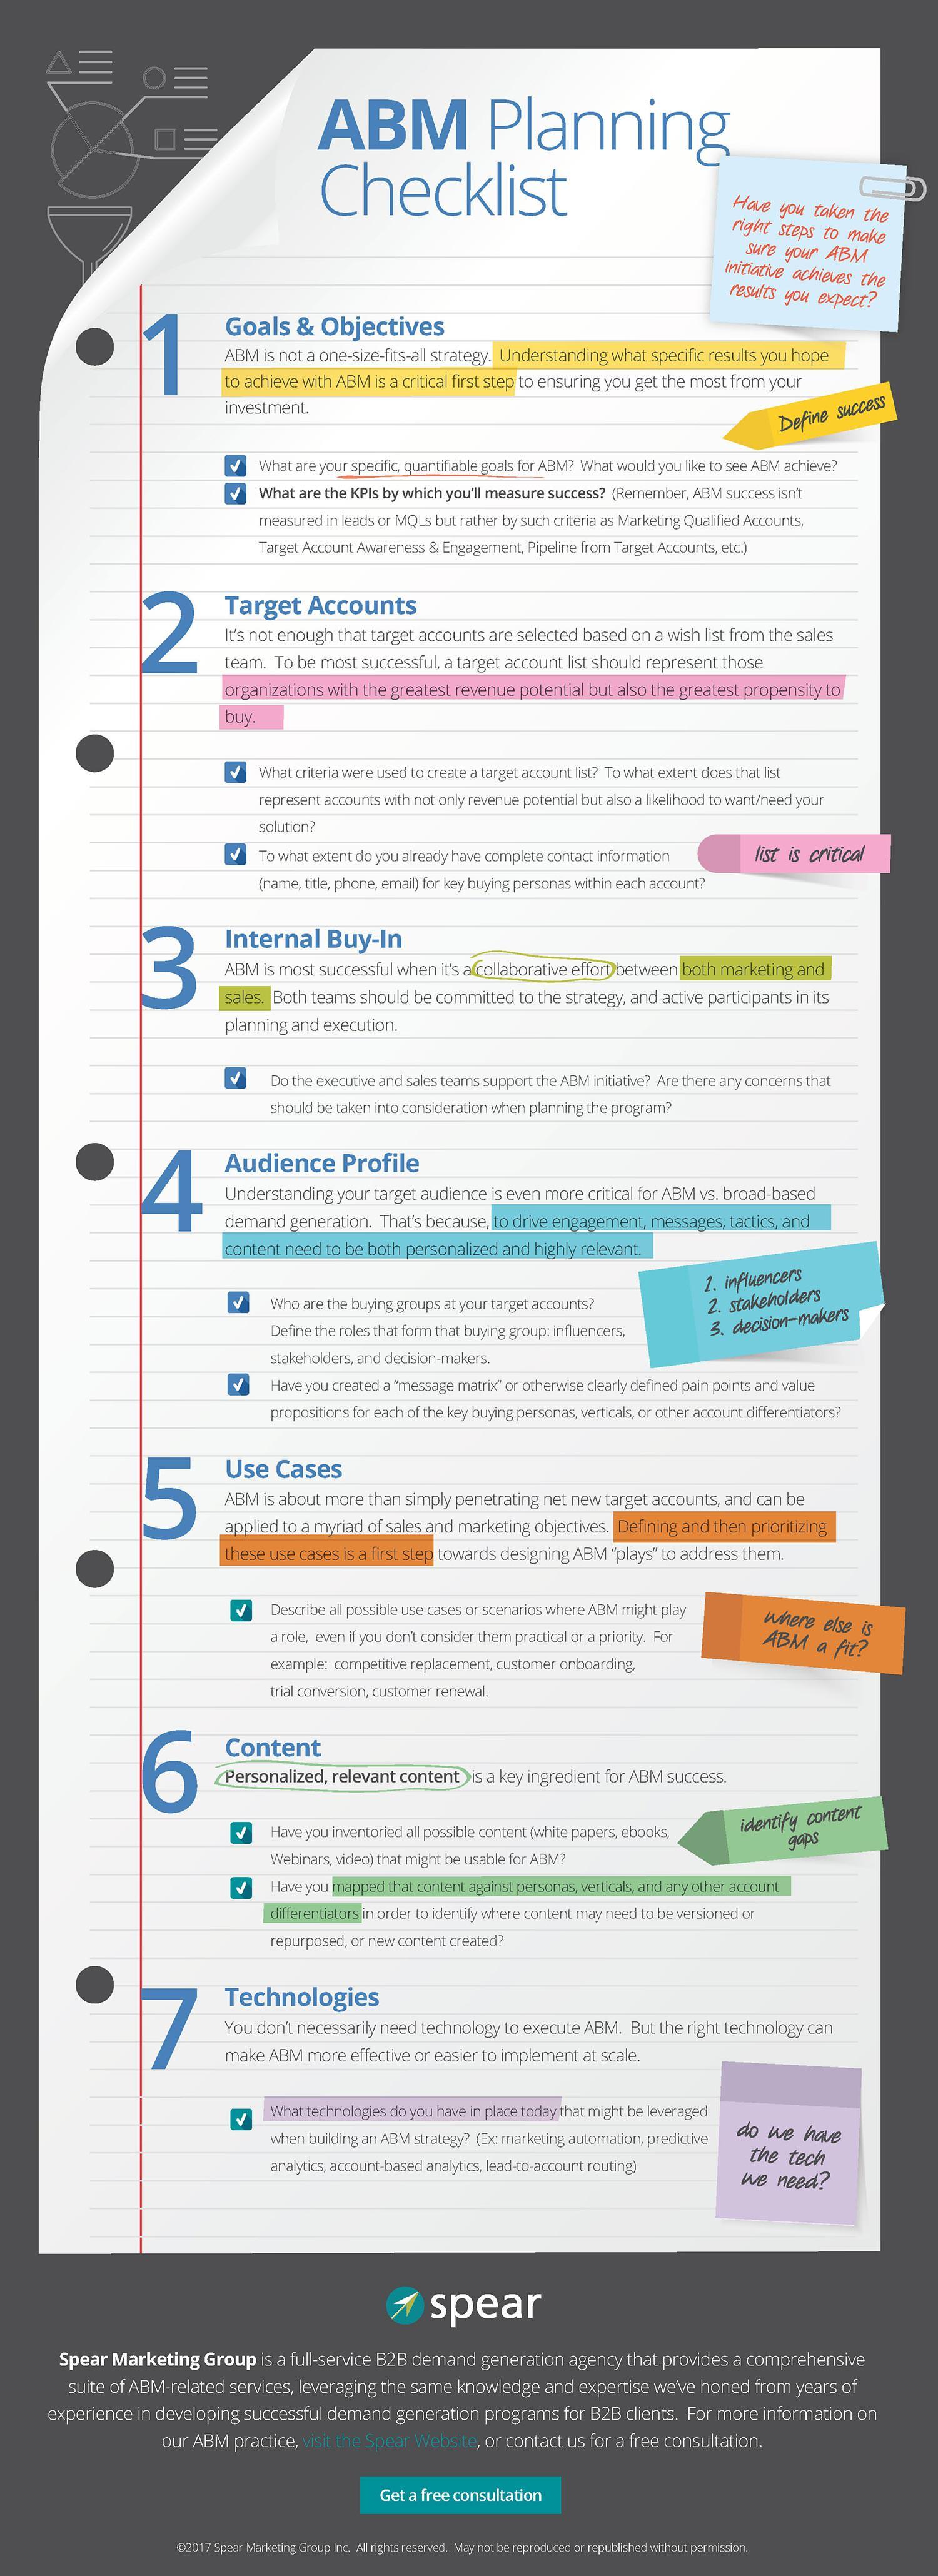 abm checklist infographic